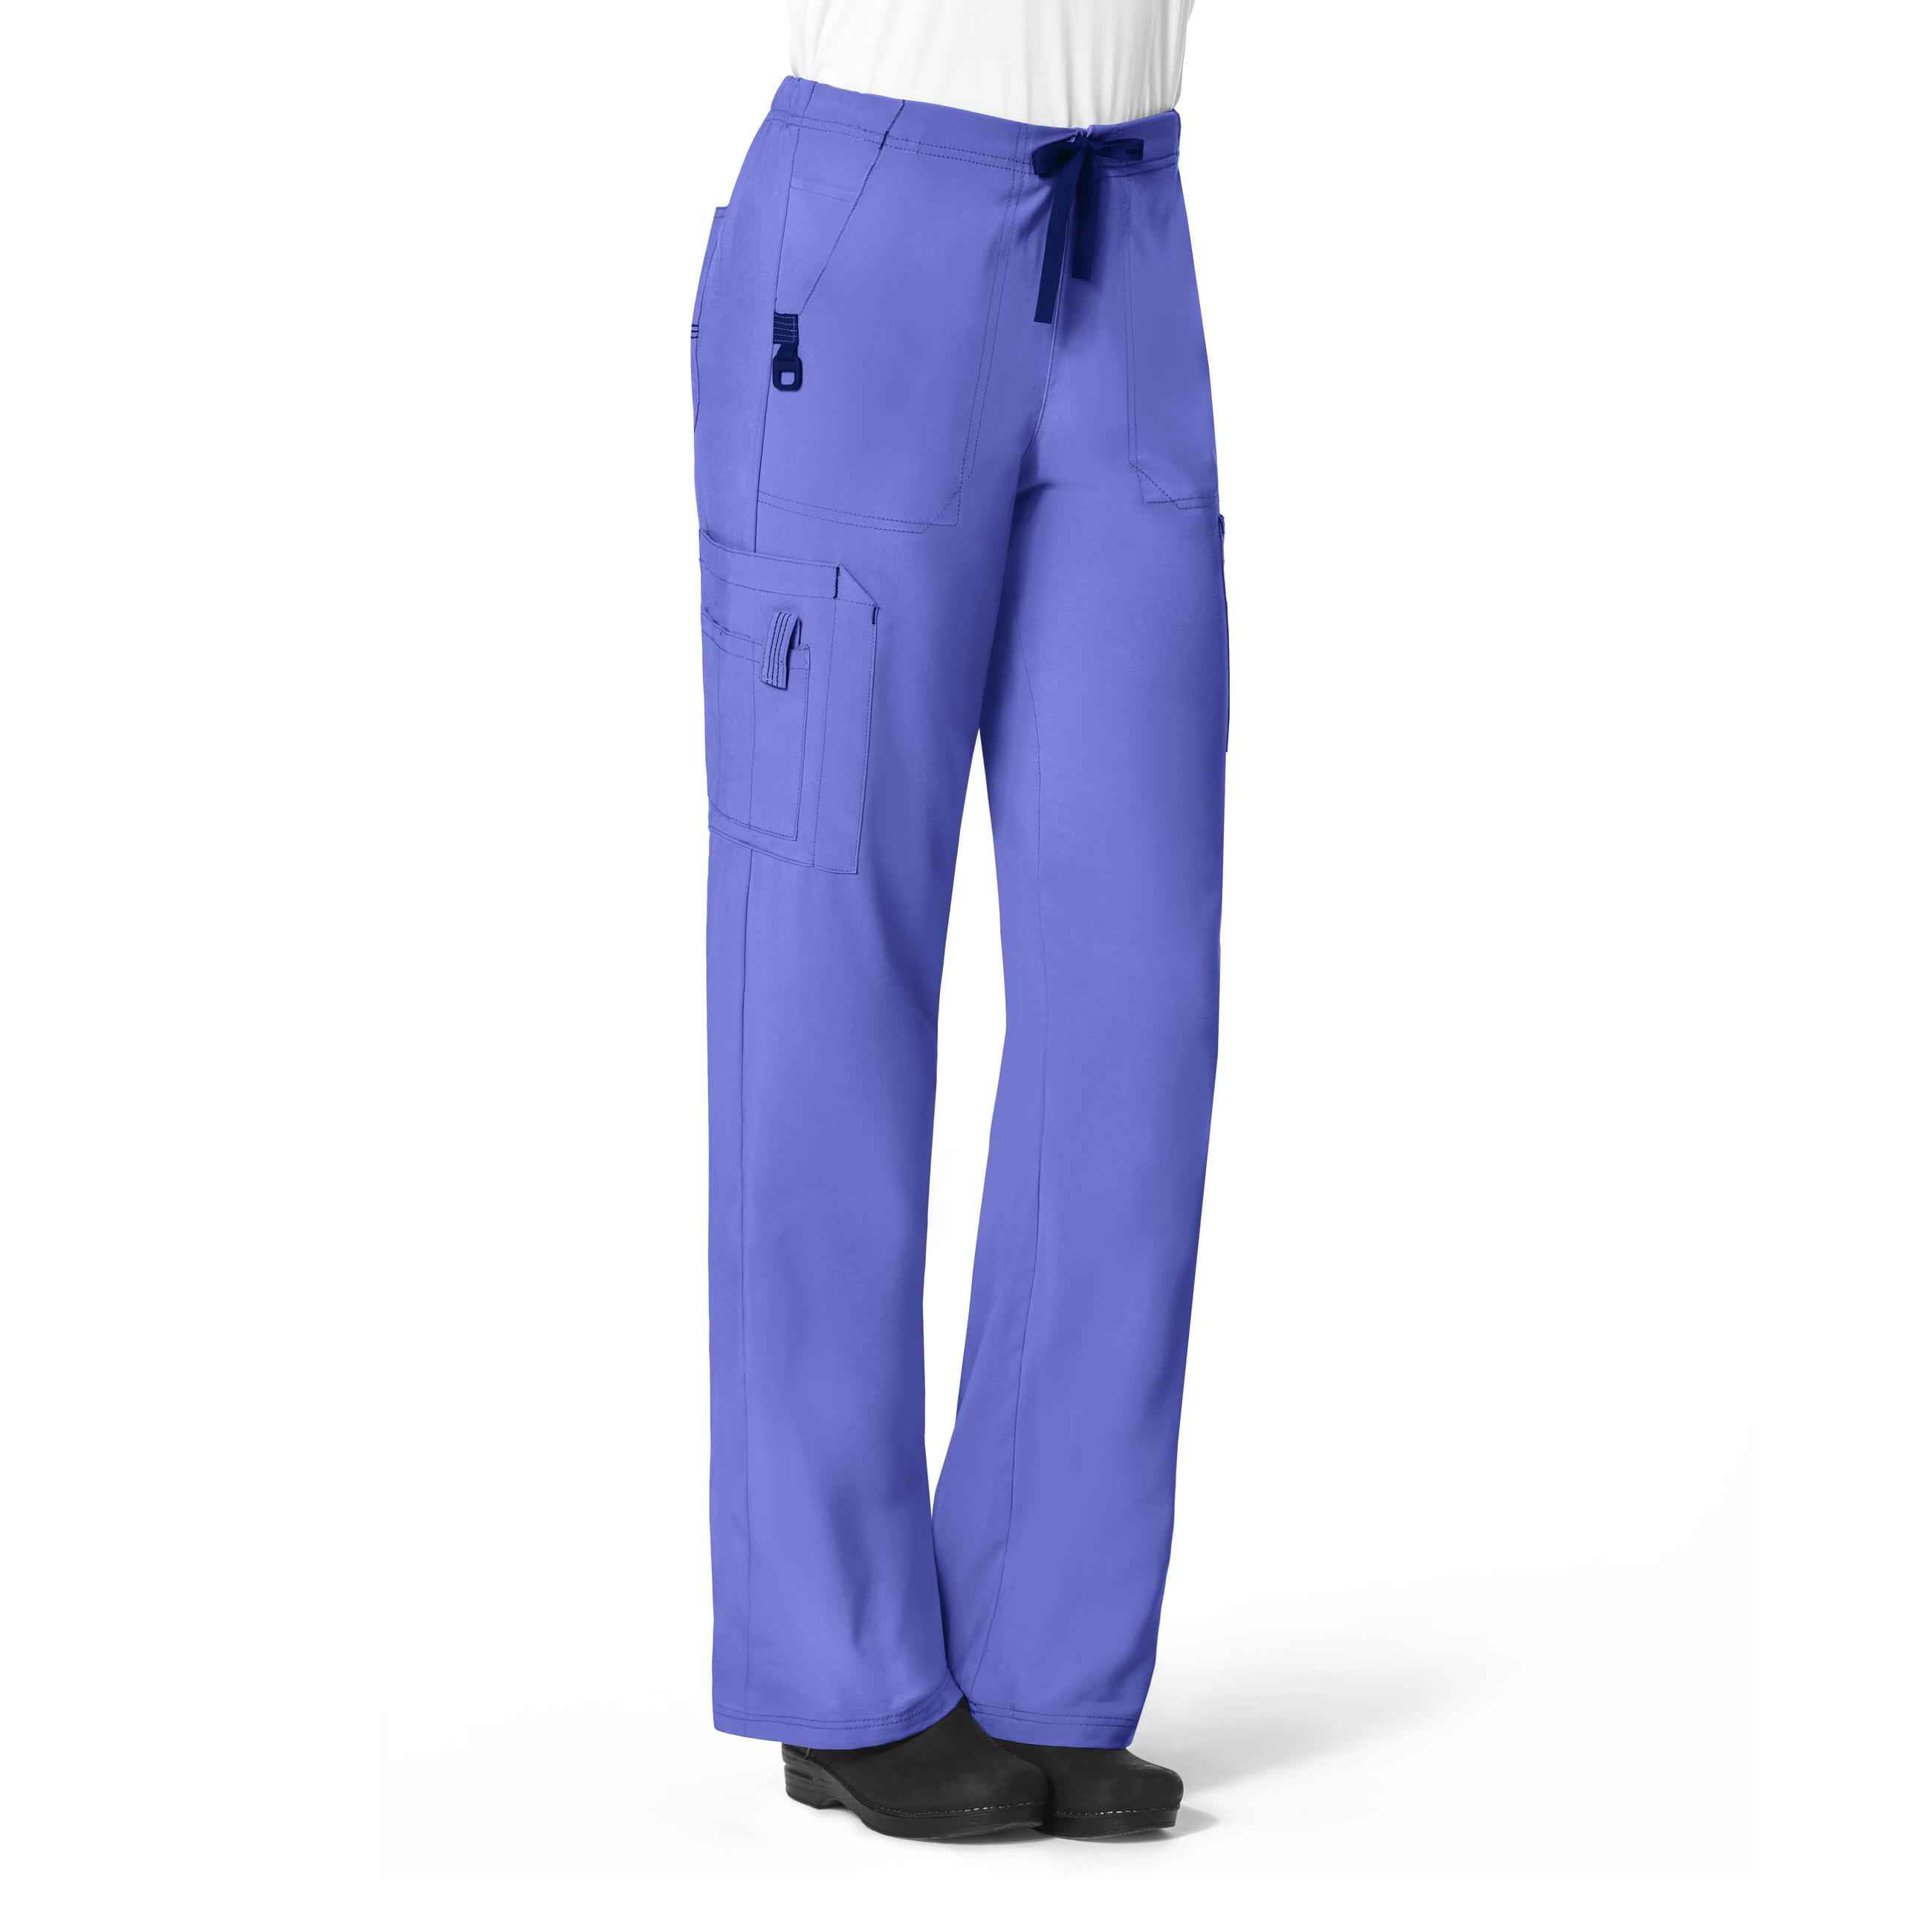 dd341aec4 Carhartt C52110 Cross-Flex Women's Utility Boot Cut Pant – Bookcliff  Workwear